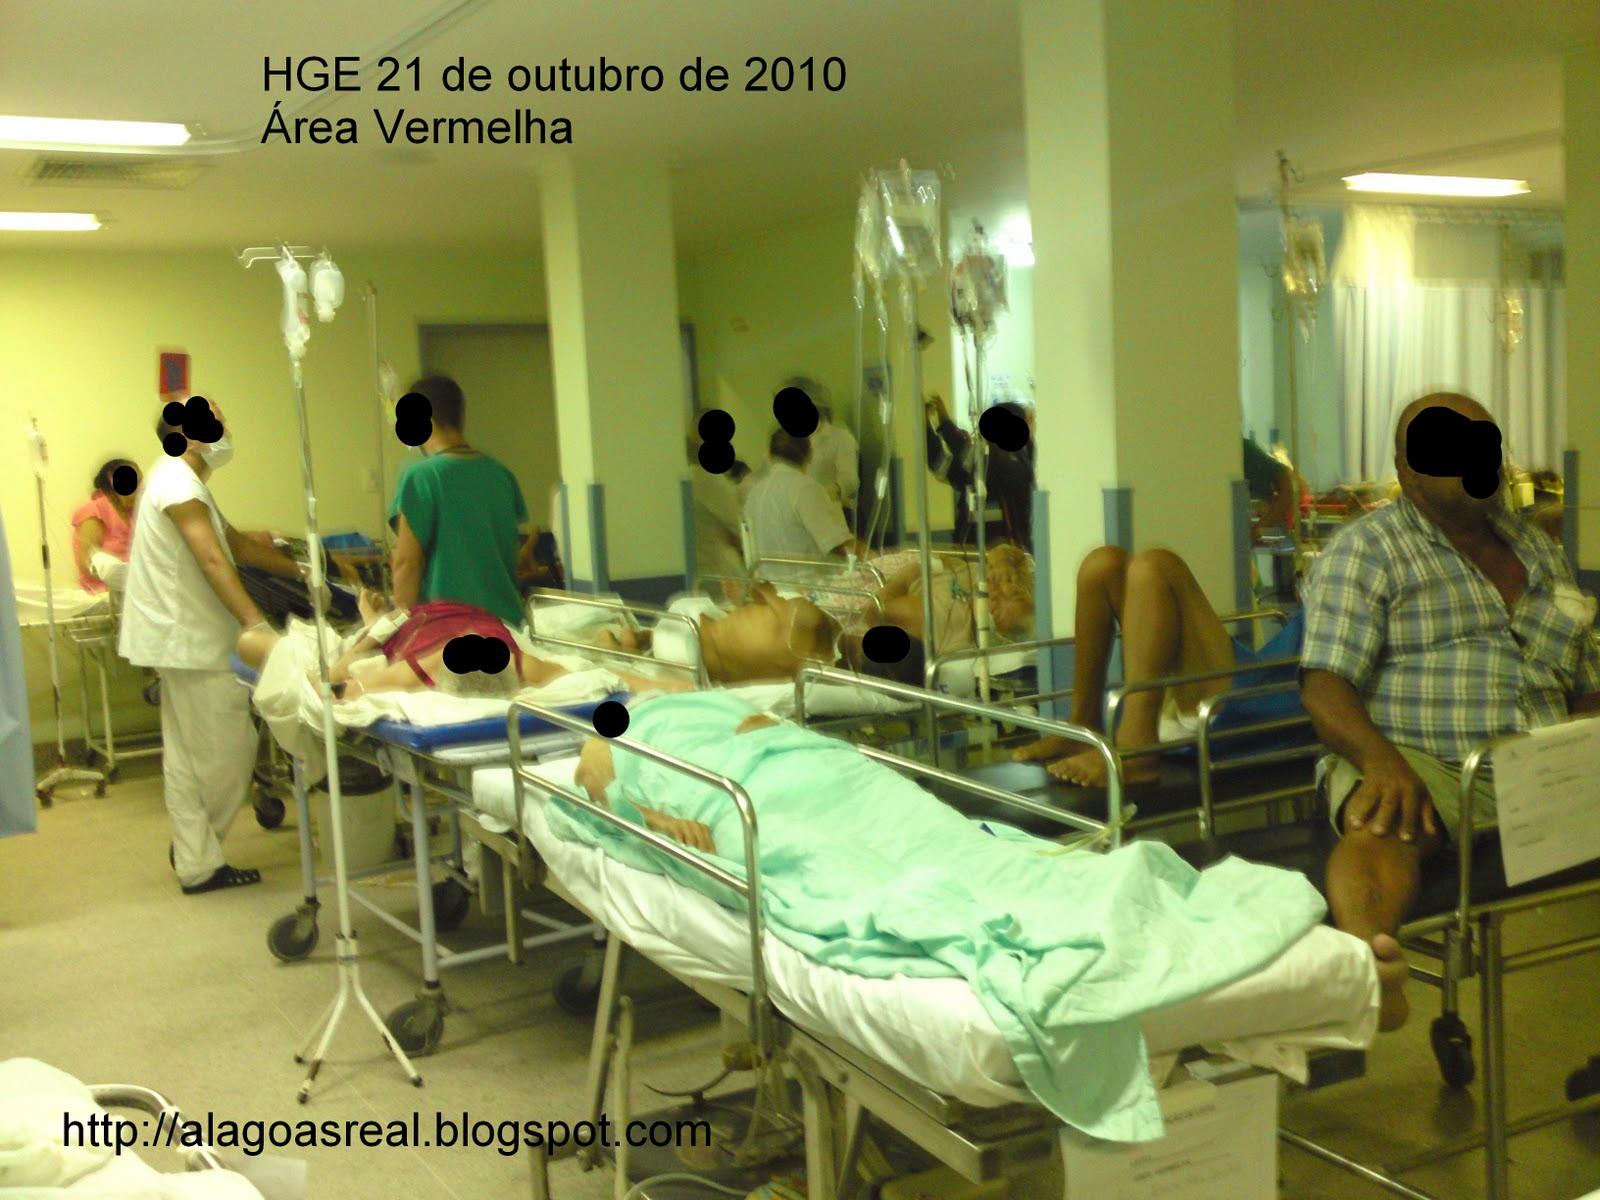 Hge real pechos 10